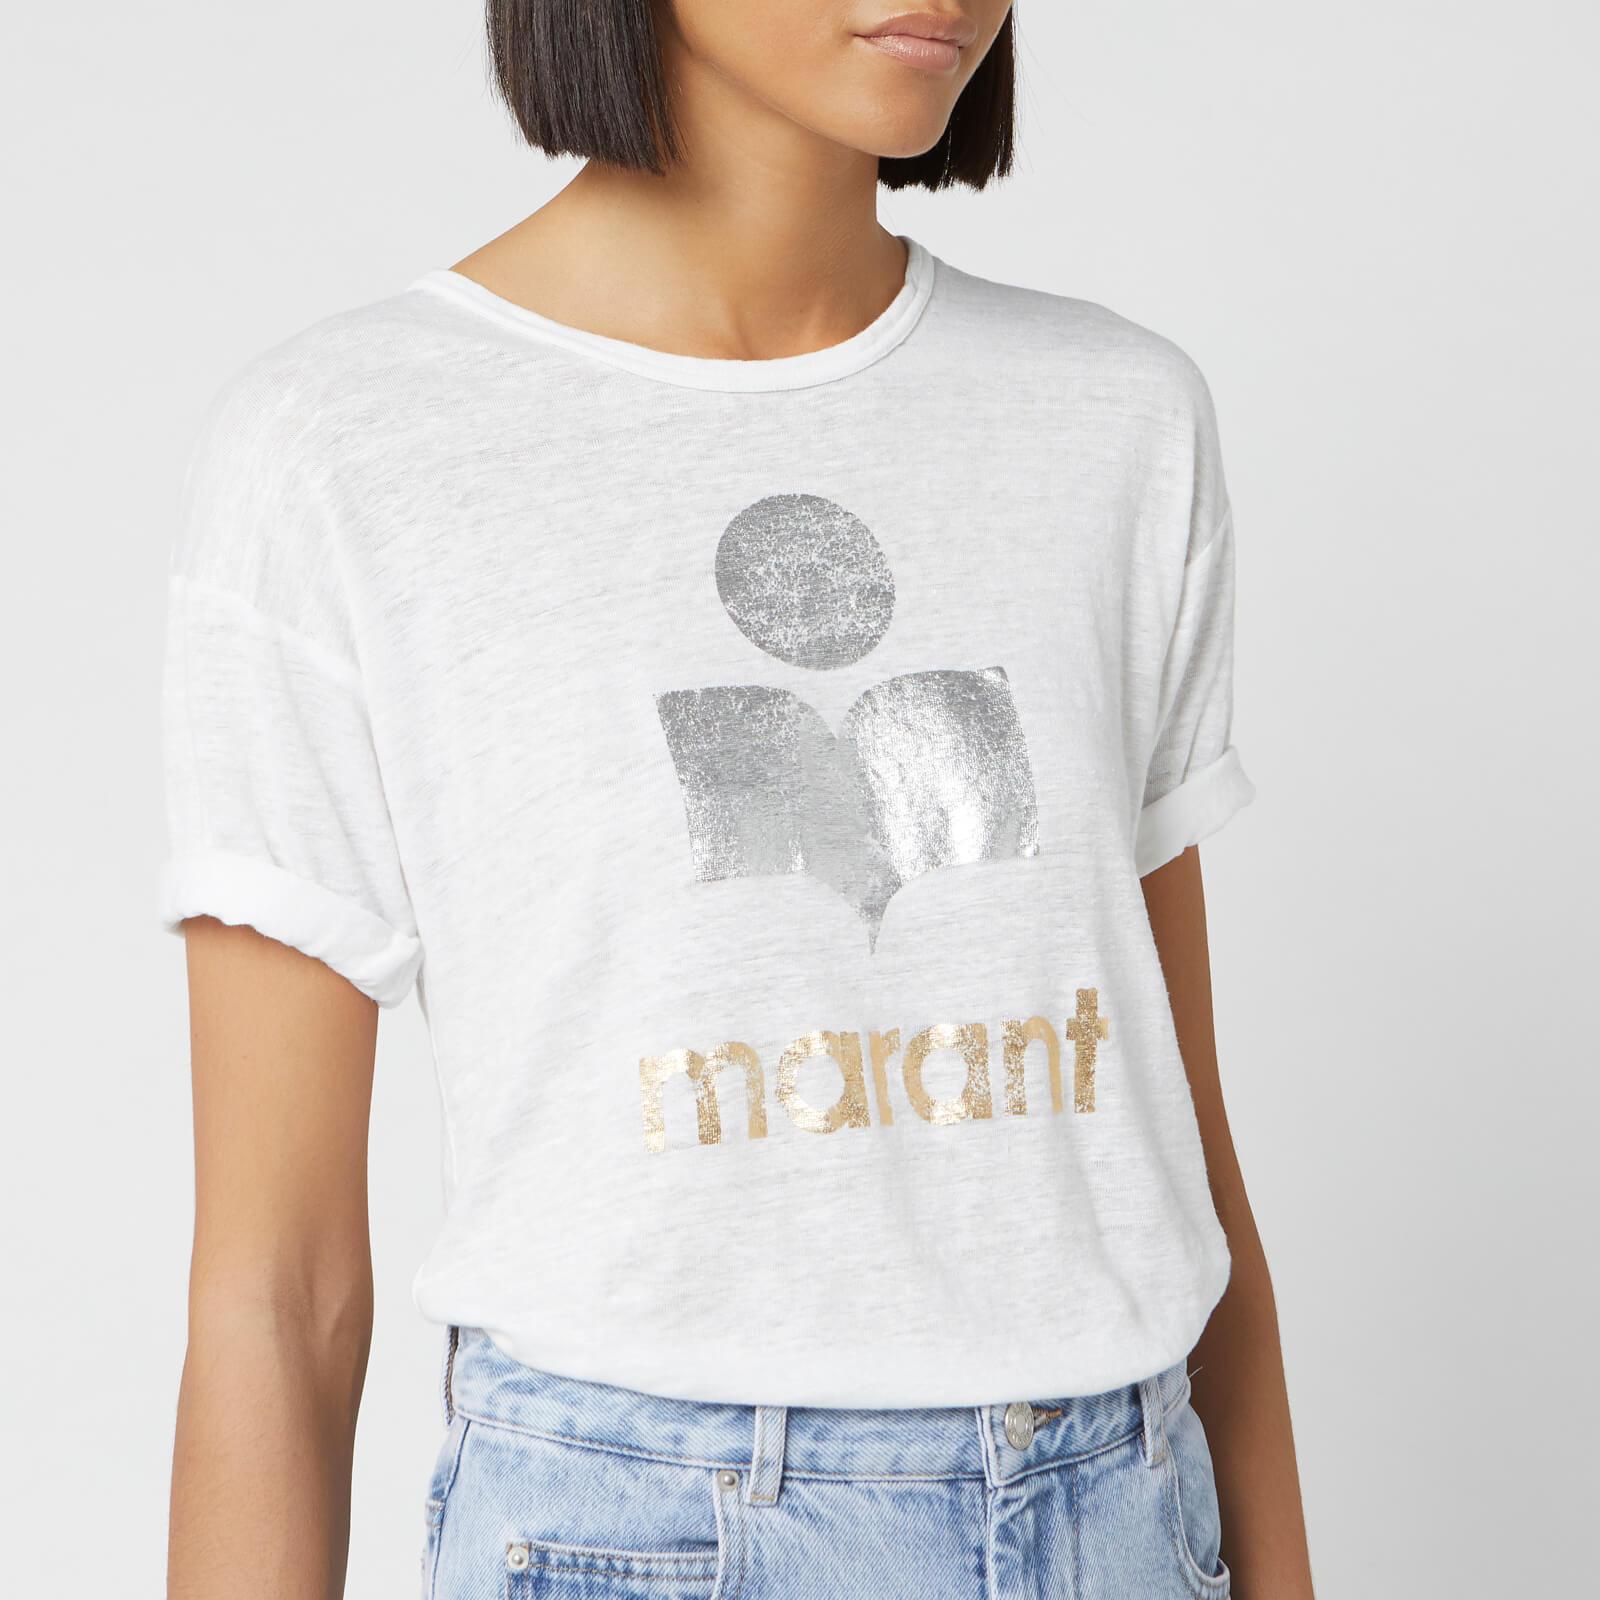 Isabel Marant Étoile Women's Koldi T-Shirt - White - S - White